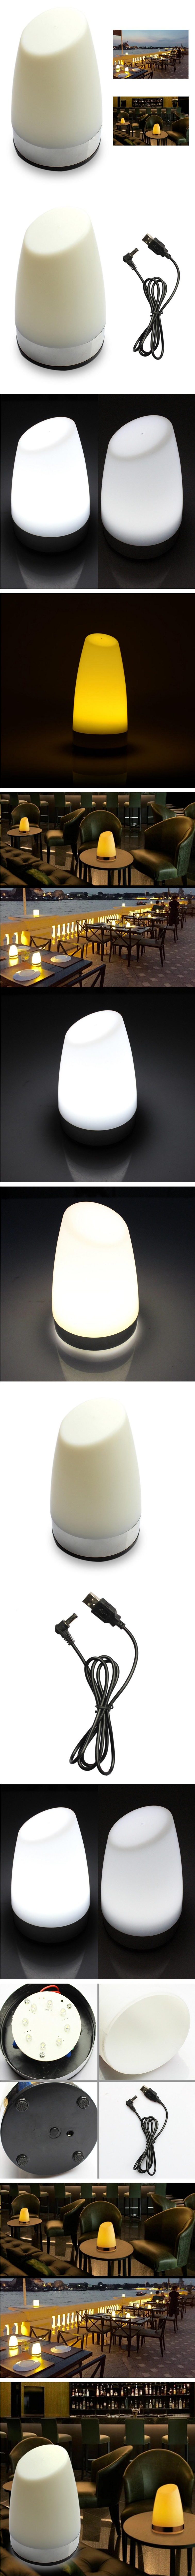 Creative Led Rechargeable Table Night Usb Bar Light Lamp Ktv Desk 5AjL34R